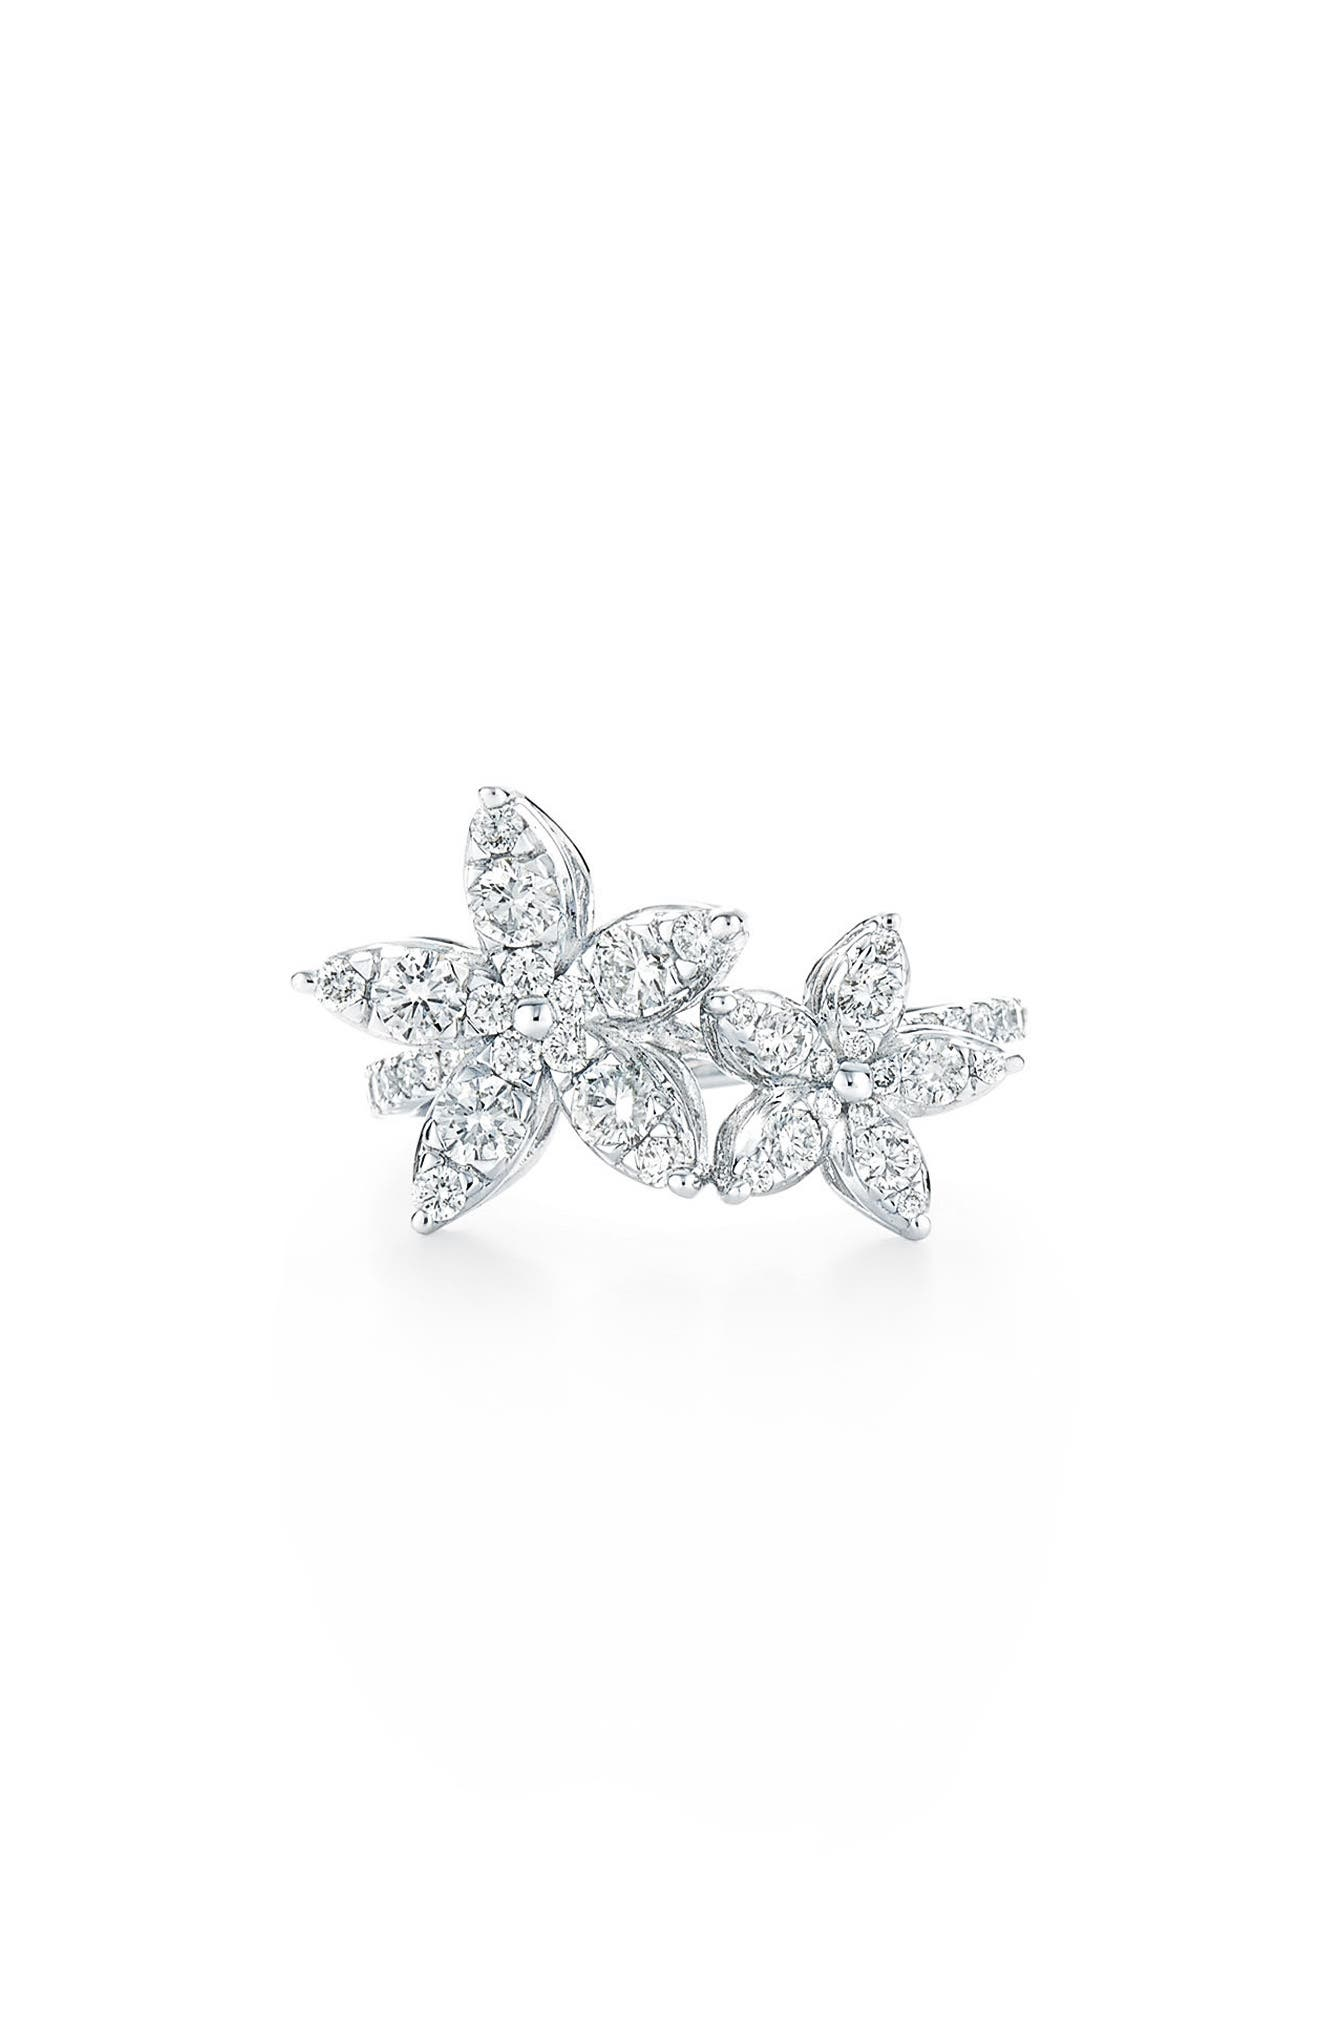 Alternate Image 1 Selected - Kwiat Sunburst Diamond Station Ring